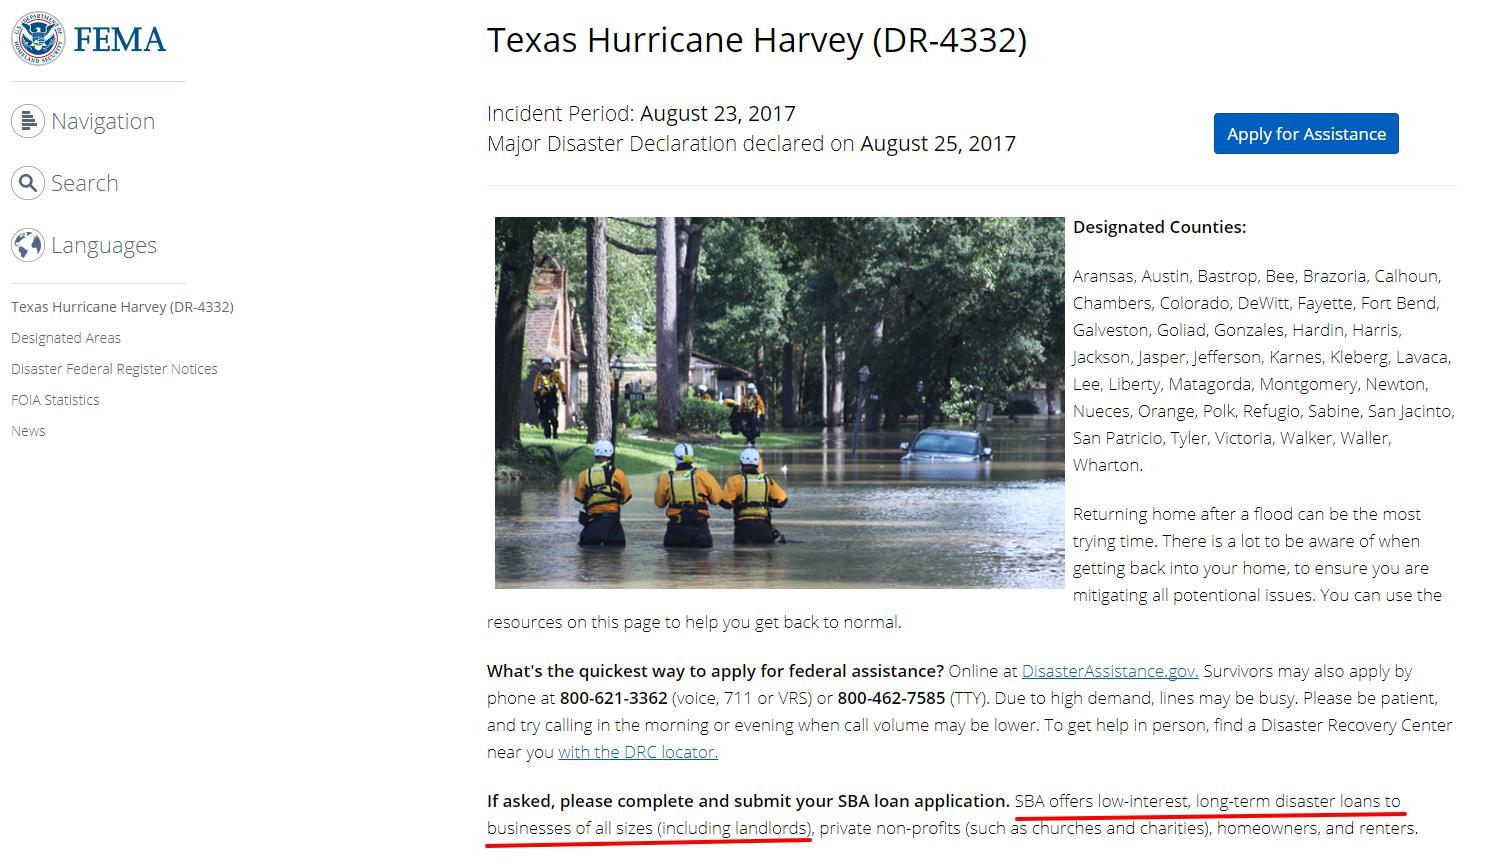 Texas Hurricane Harvey - FEMA page